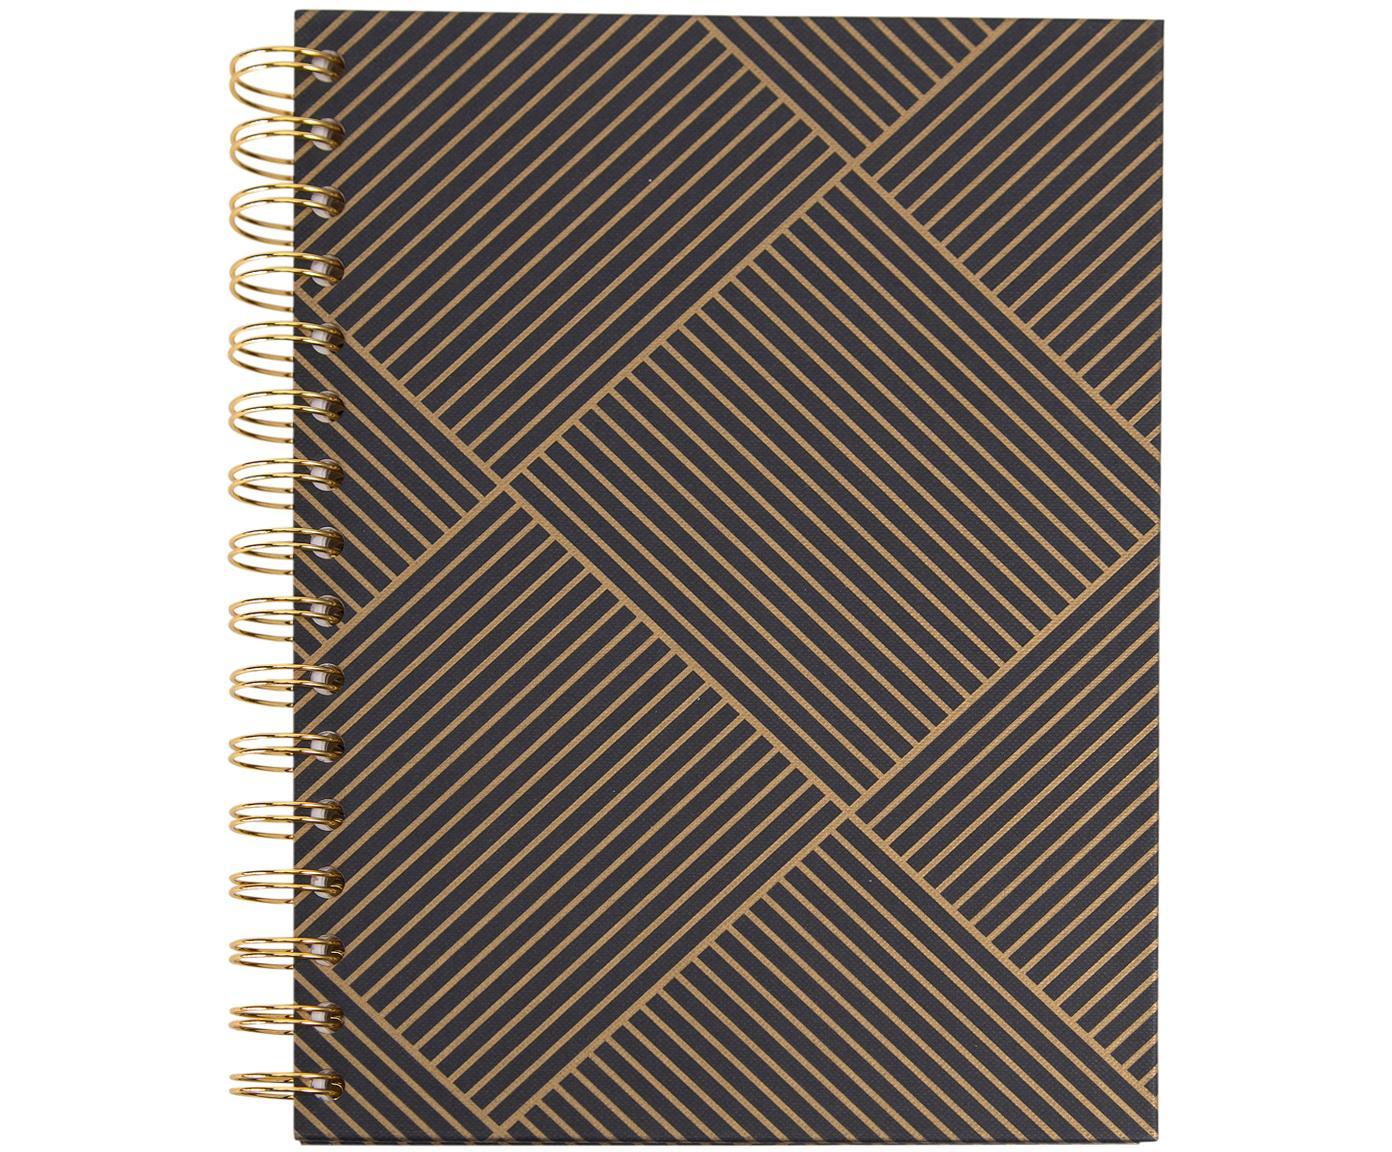 Notitieboek Bürli, Goudkleurig, donkergrijs, 16 x 21 cm